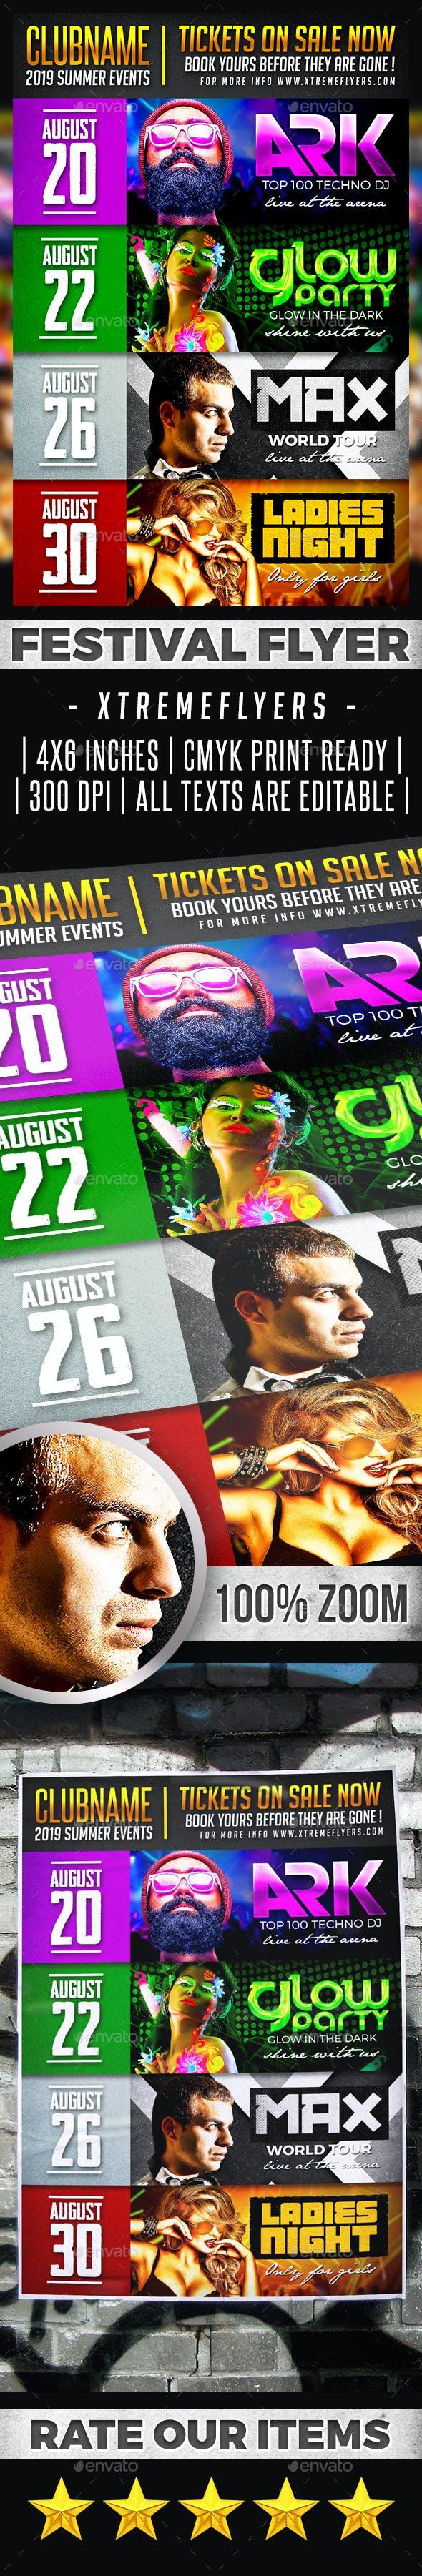 Festival Schedule Flyer